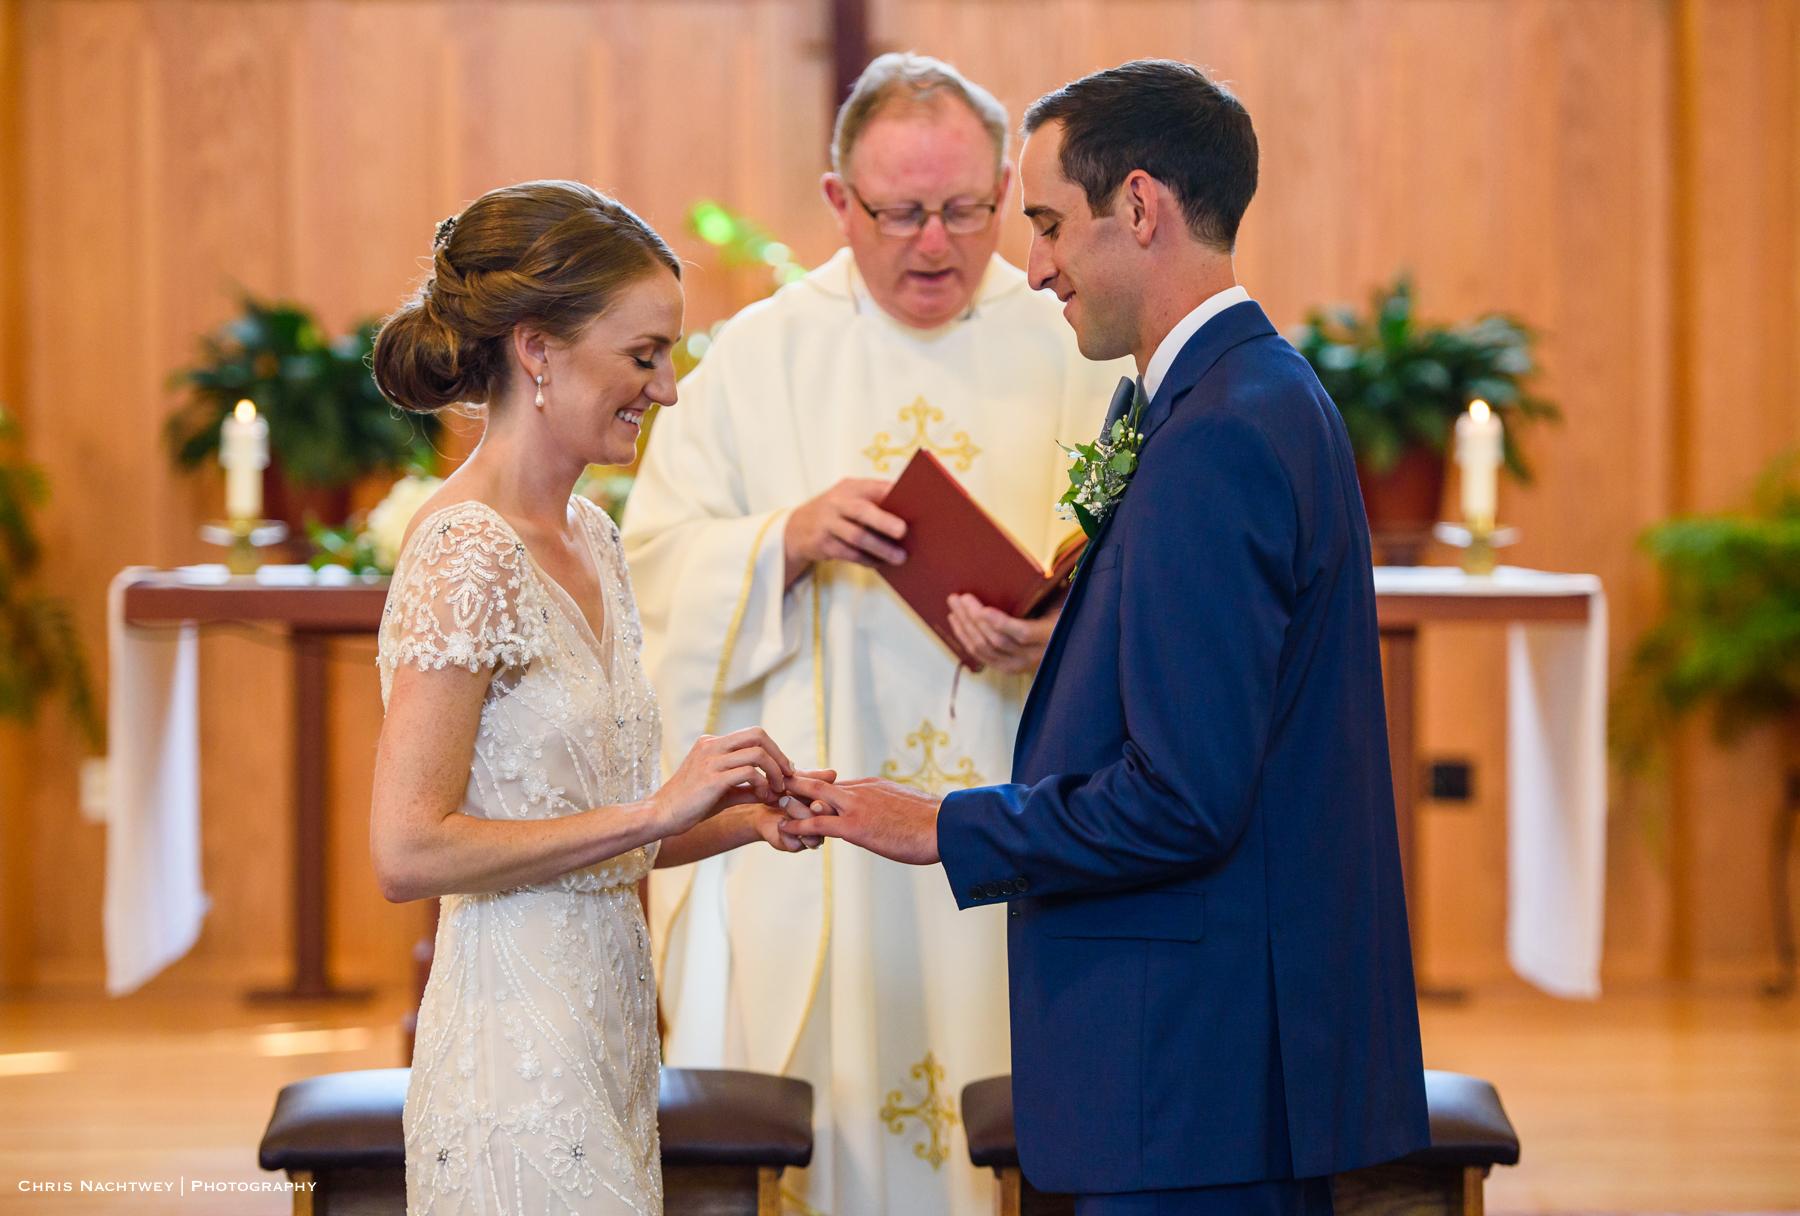 photos-wedding-quidnessett-country-club-ri-chris-nachtwey-photography-2018-24.jpg